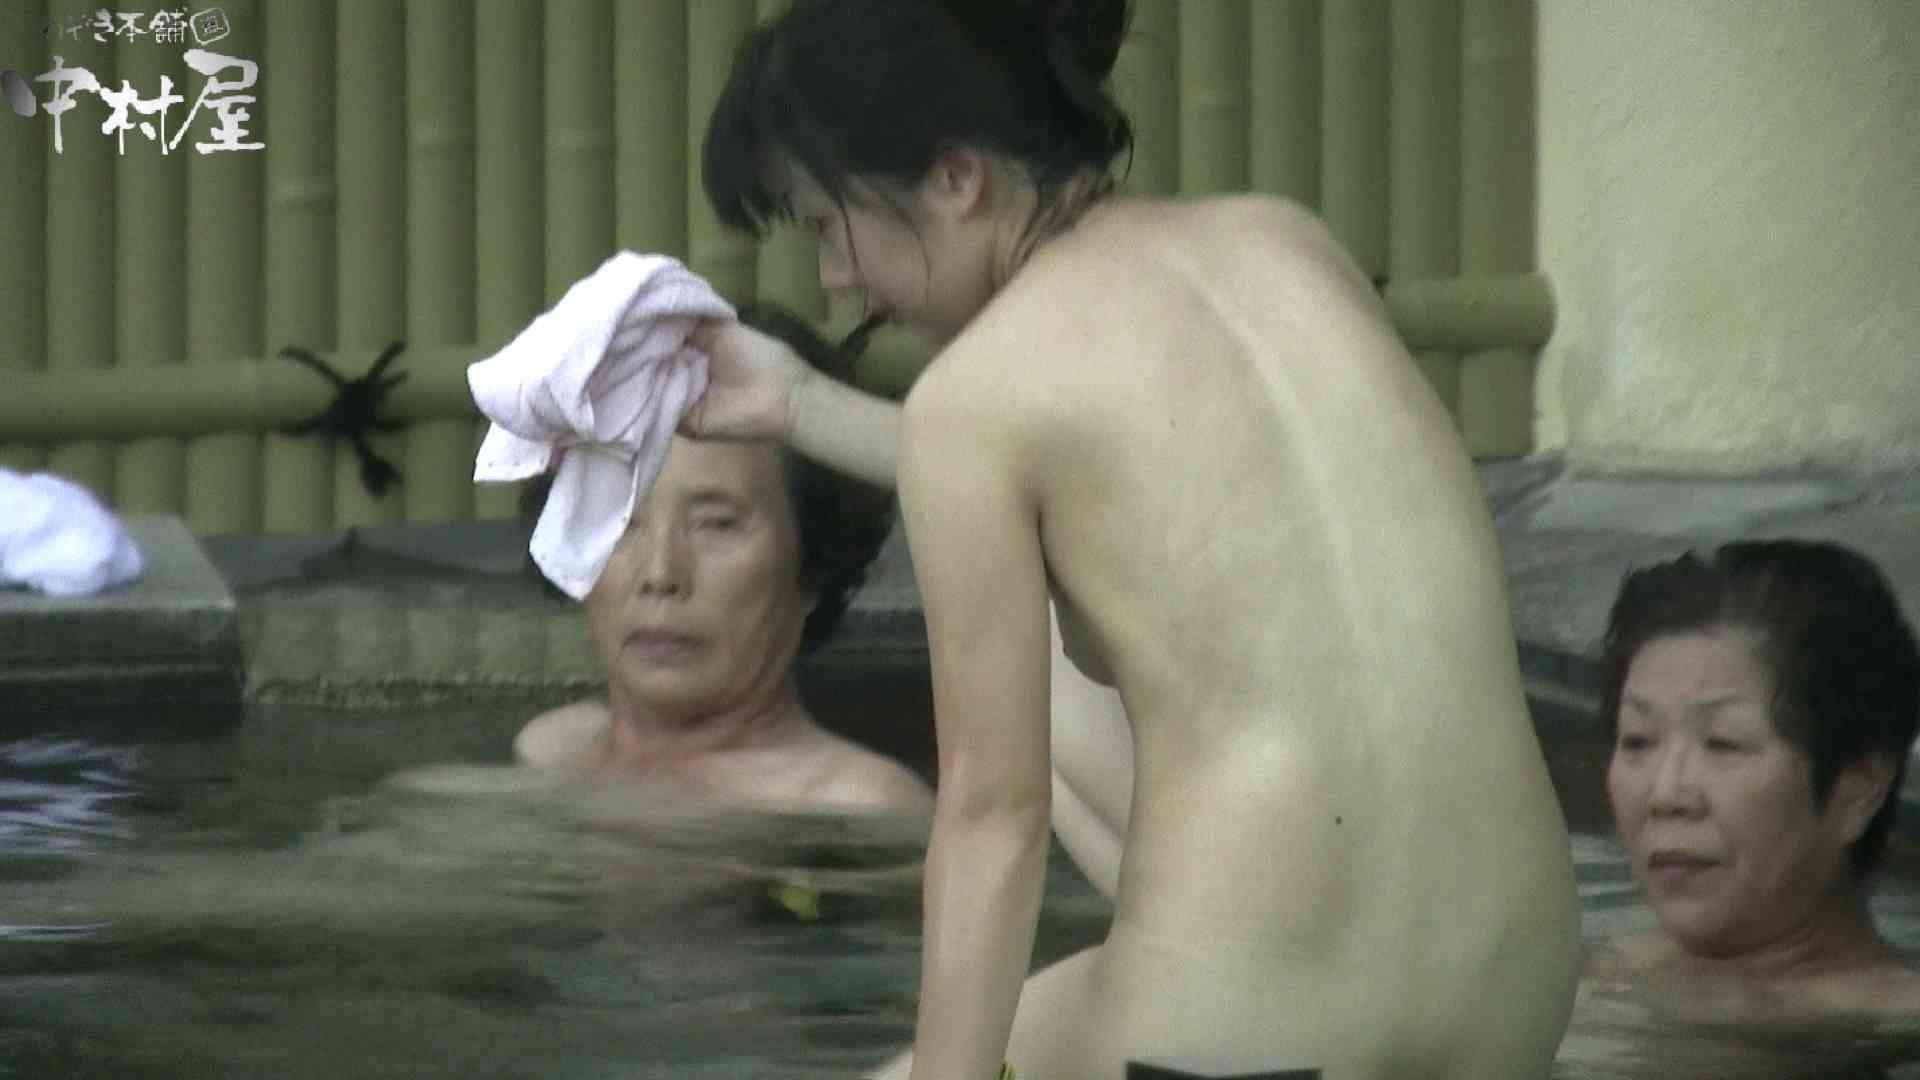 Aquaな露天風呂Vol.904 OL女体 アダルト動画キャプチャ 85連発 2